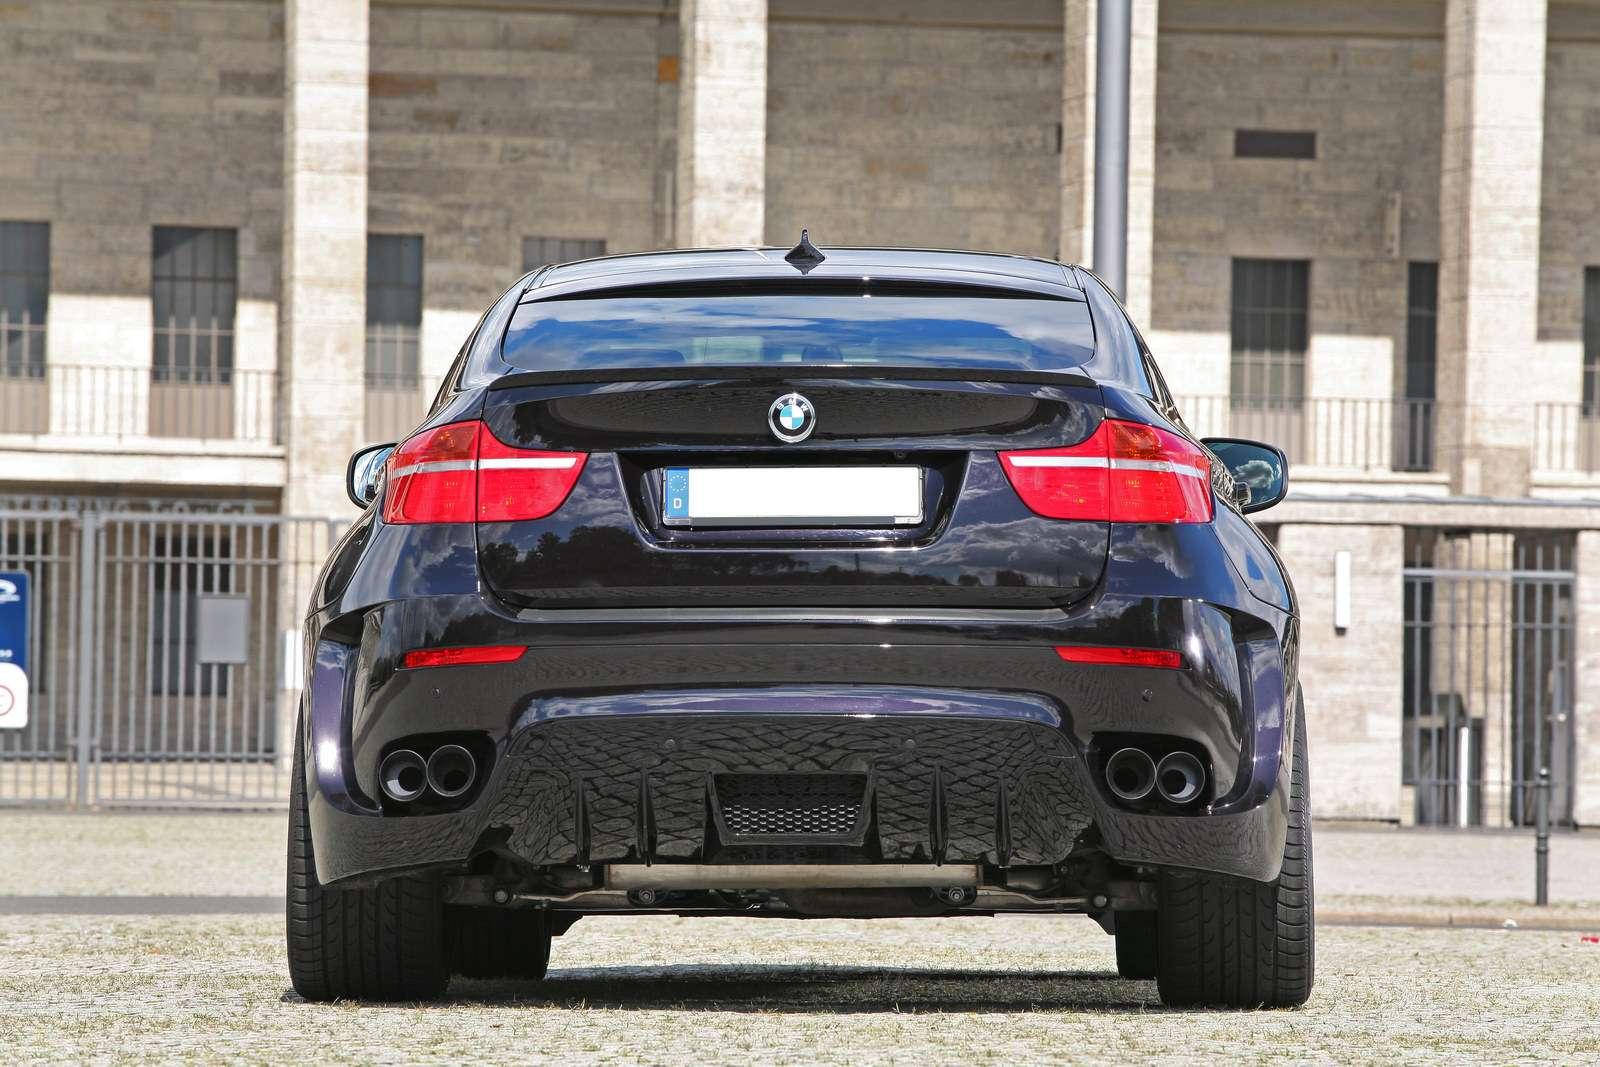 BMW X6 Bruiser od CLP Automotive fot listopad 2011